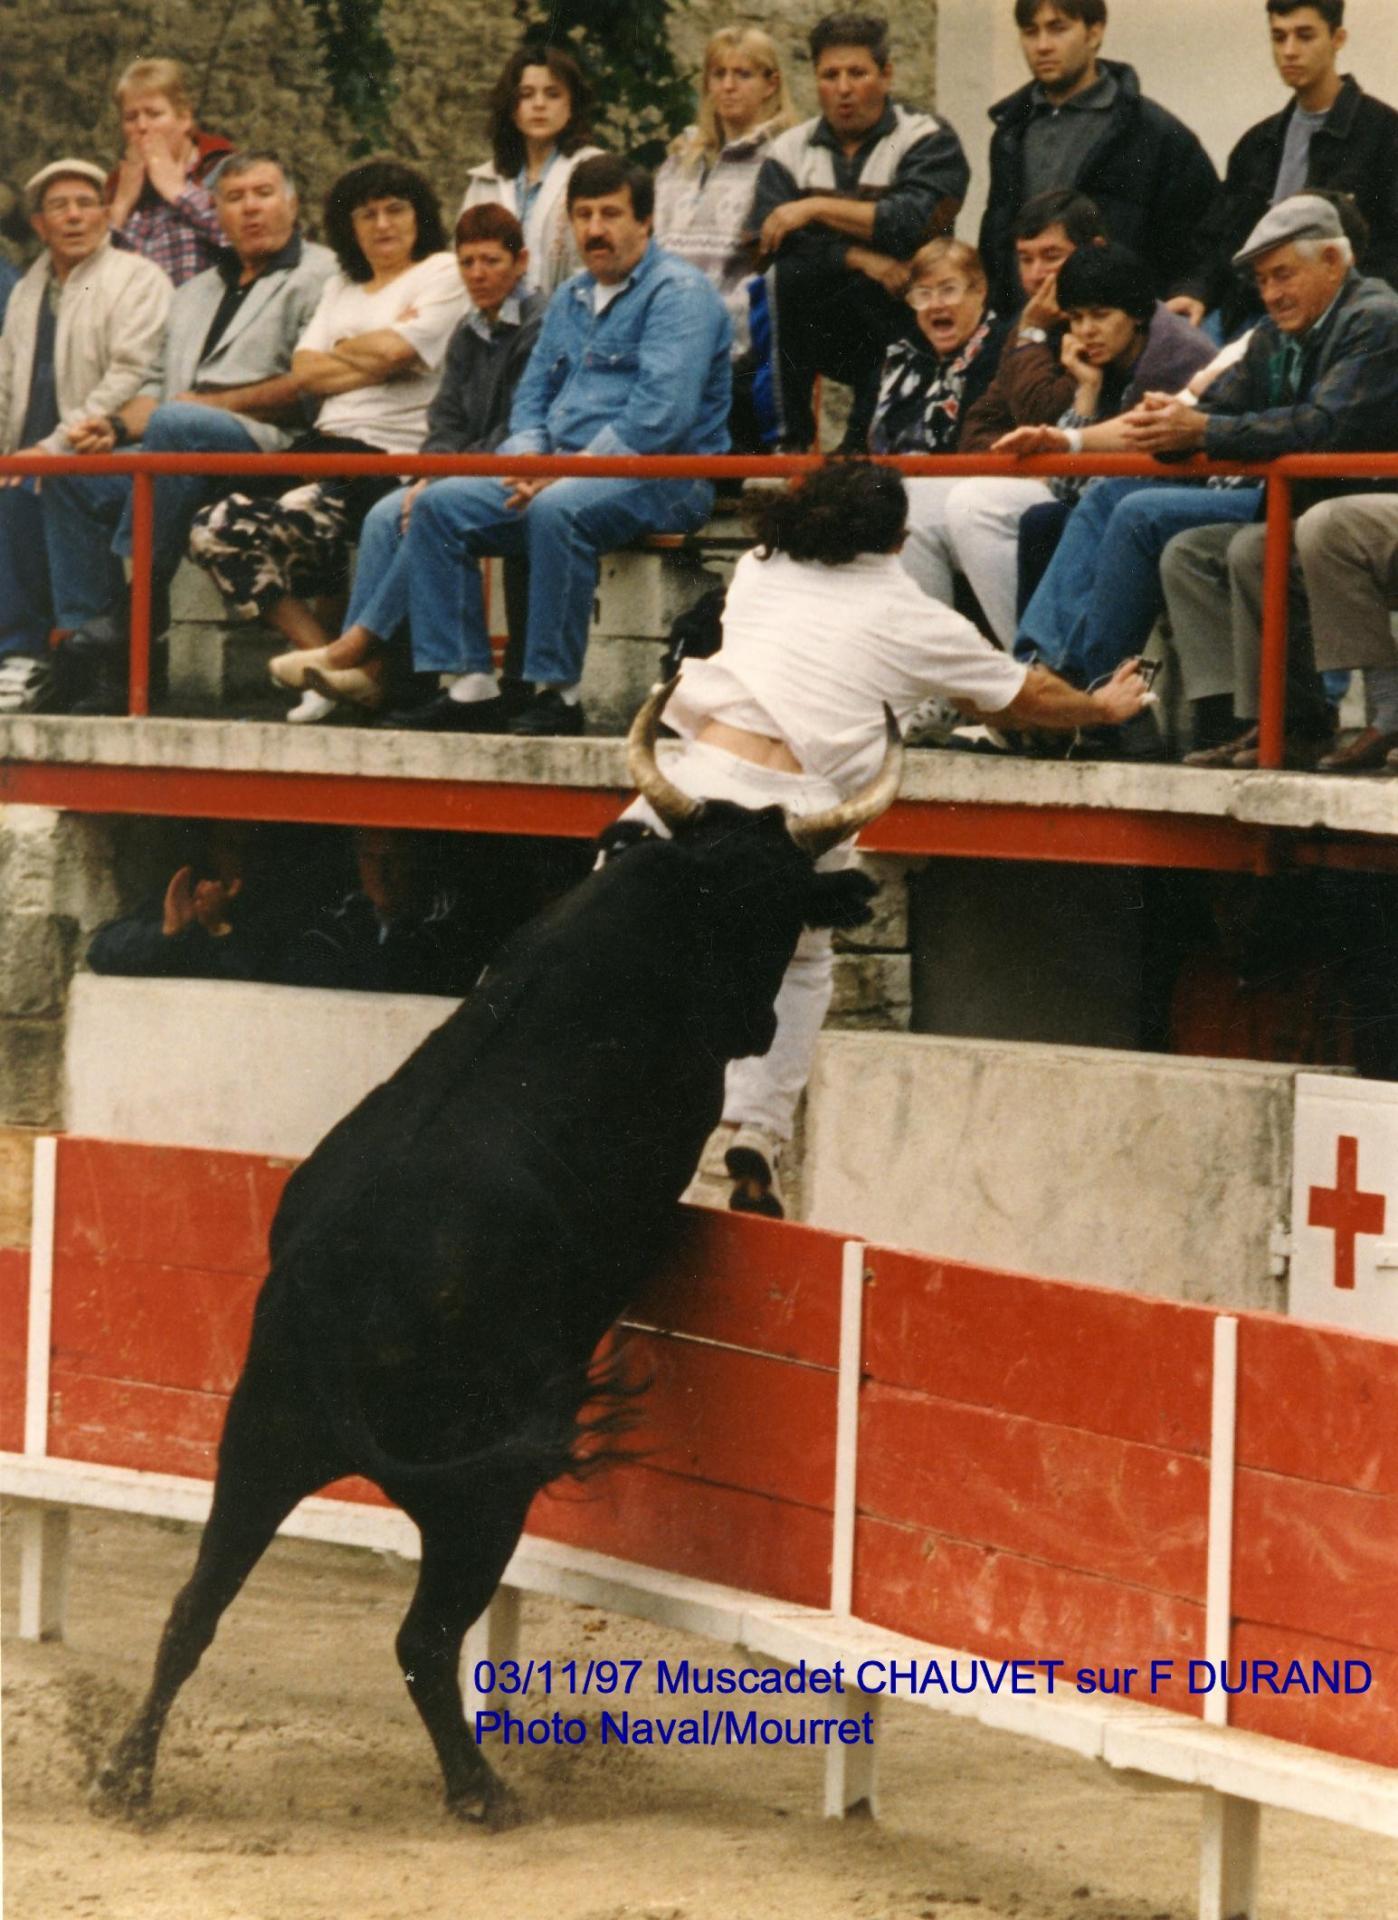 F durand muscadet 1997